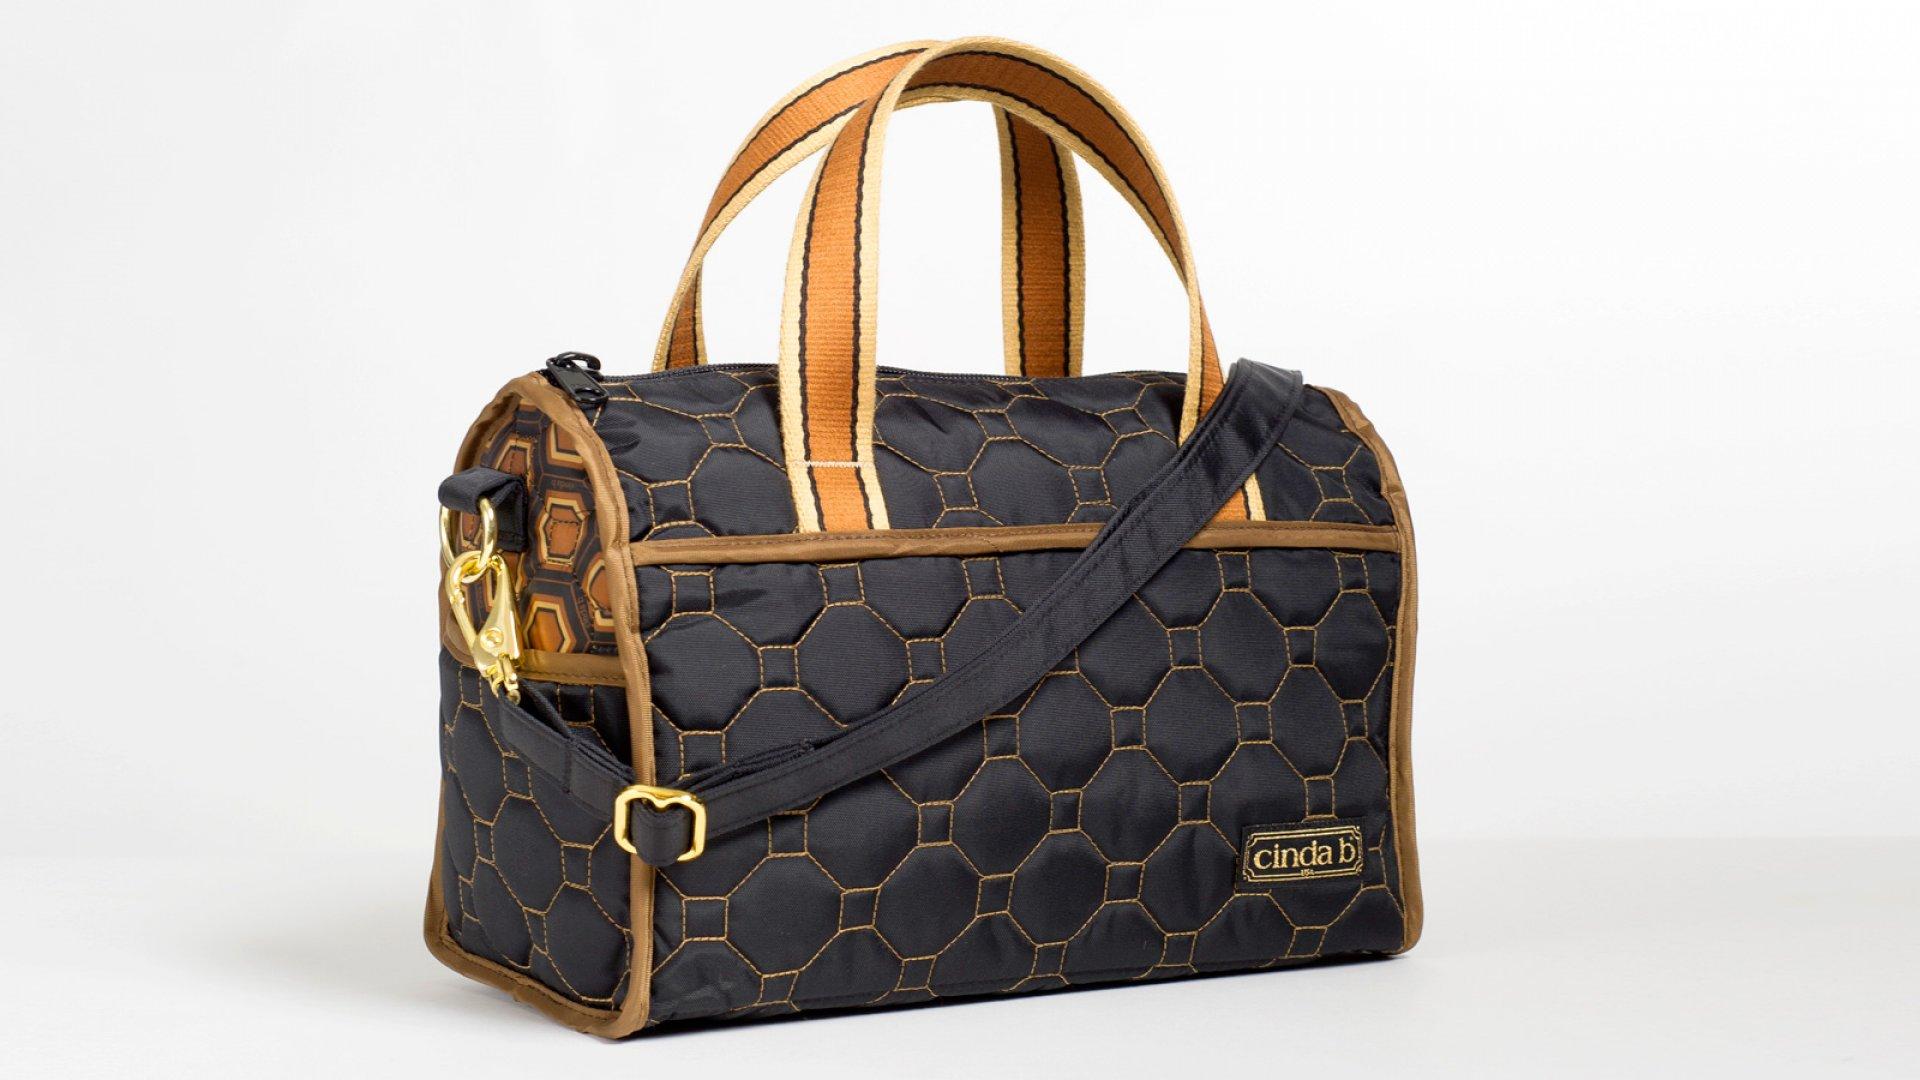 Cinda b Handbags: American Made, Locally Sourced